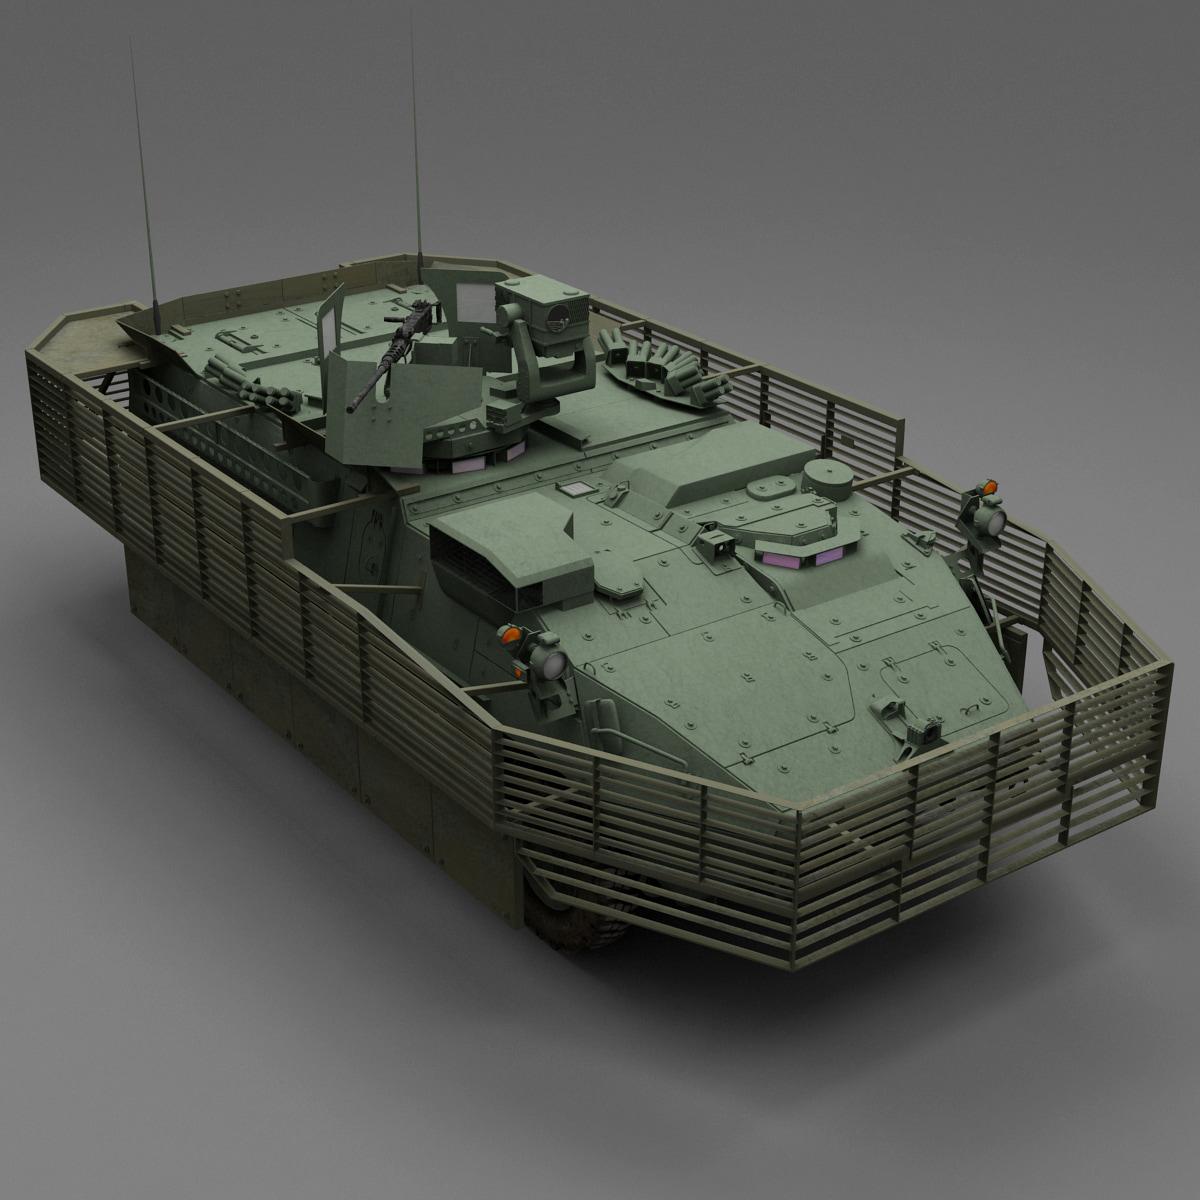 M1131_Stryker_Fire_Support_Vehicle_max_0001.jpg